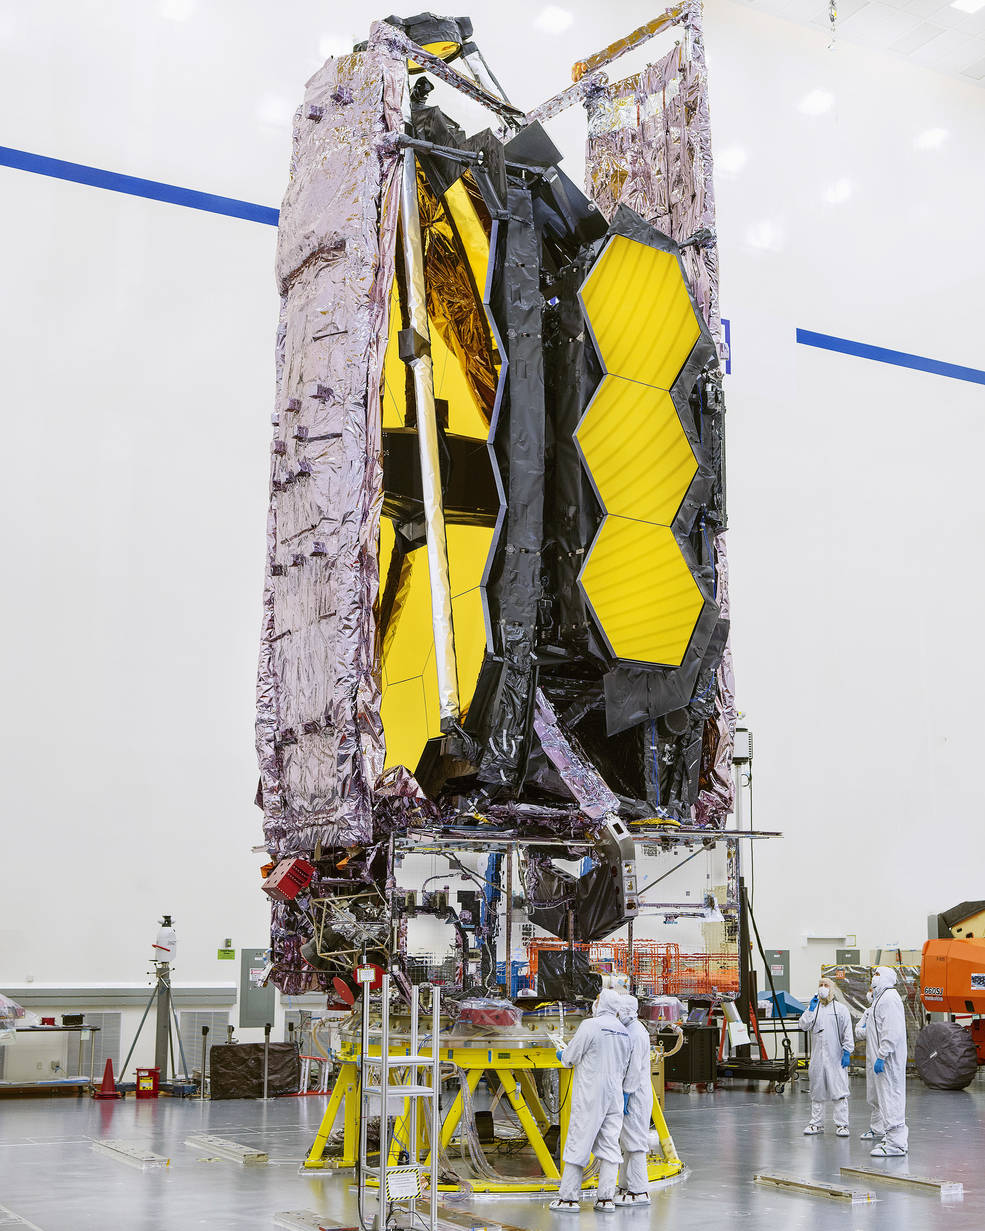 NASA / Chris Gunn